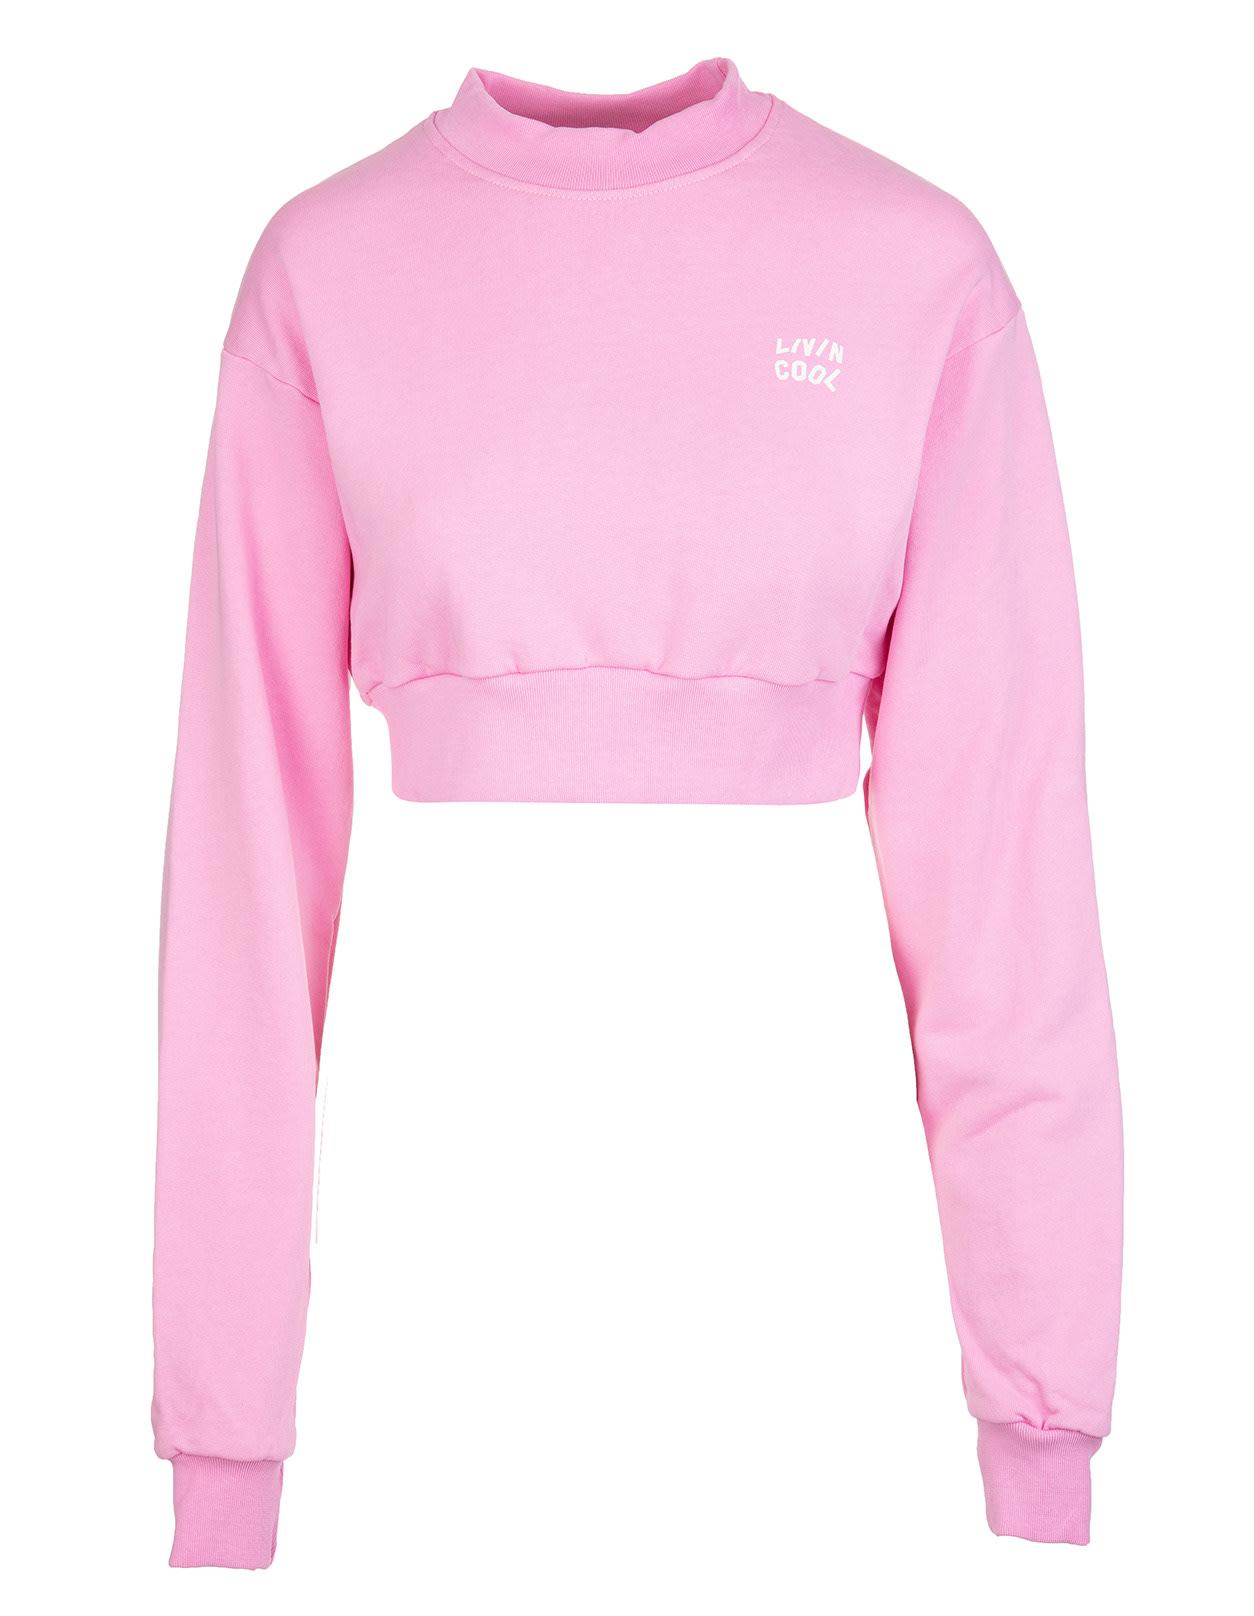 Wiman Pink Crop Sweatshirt With Micro Logo